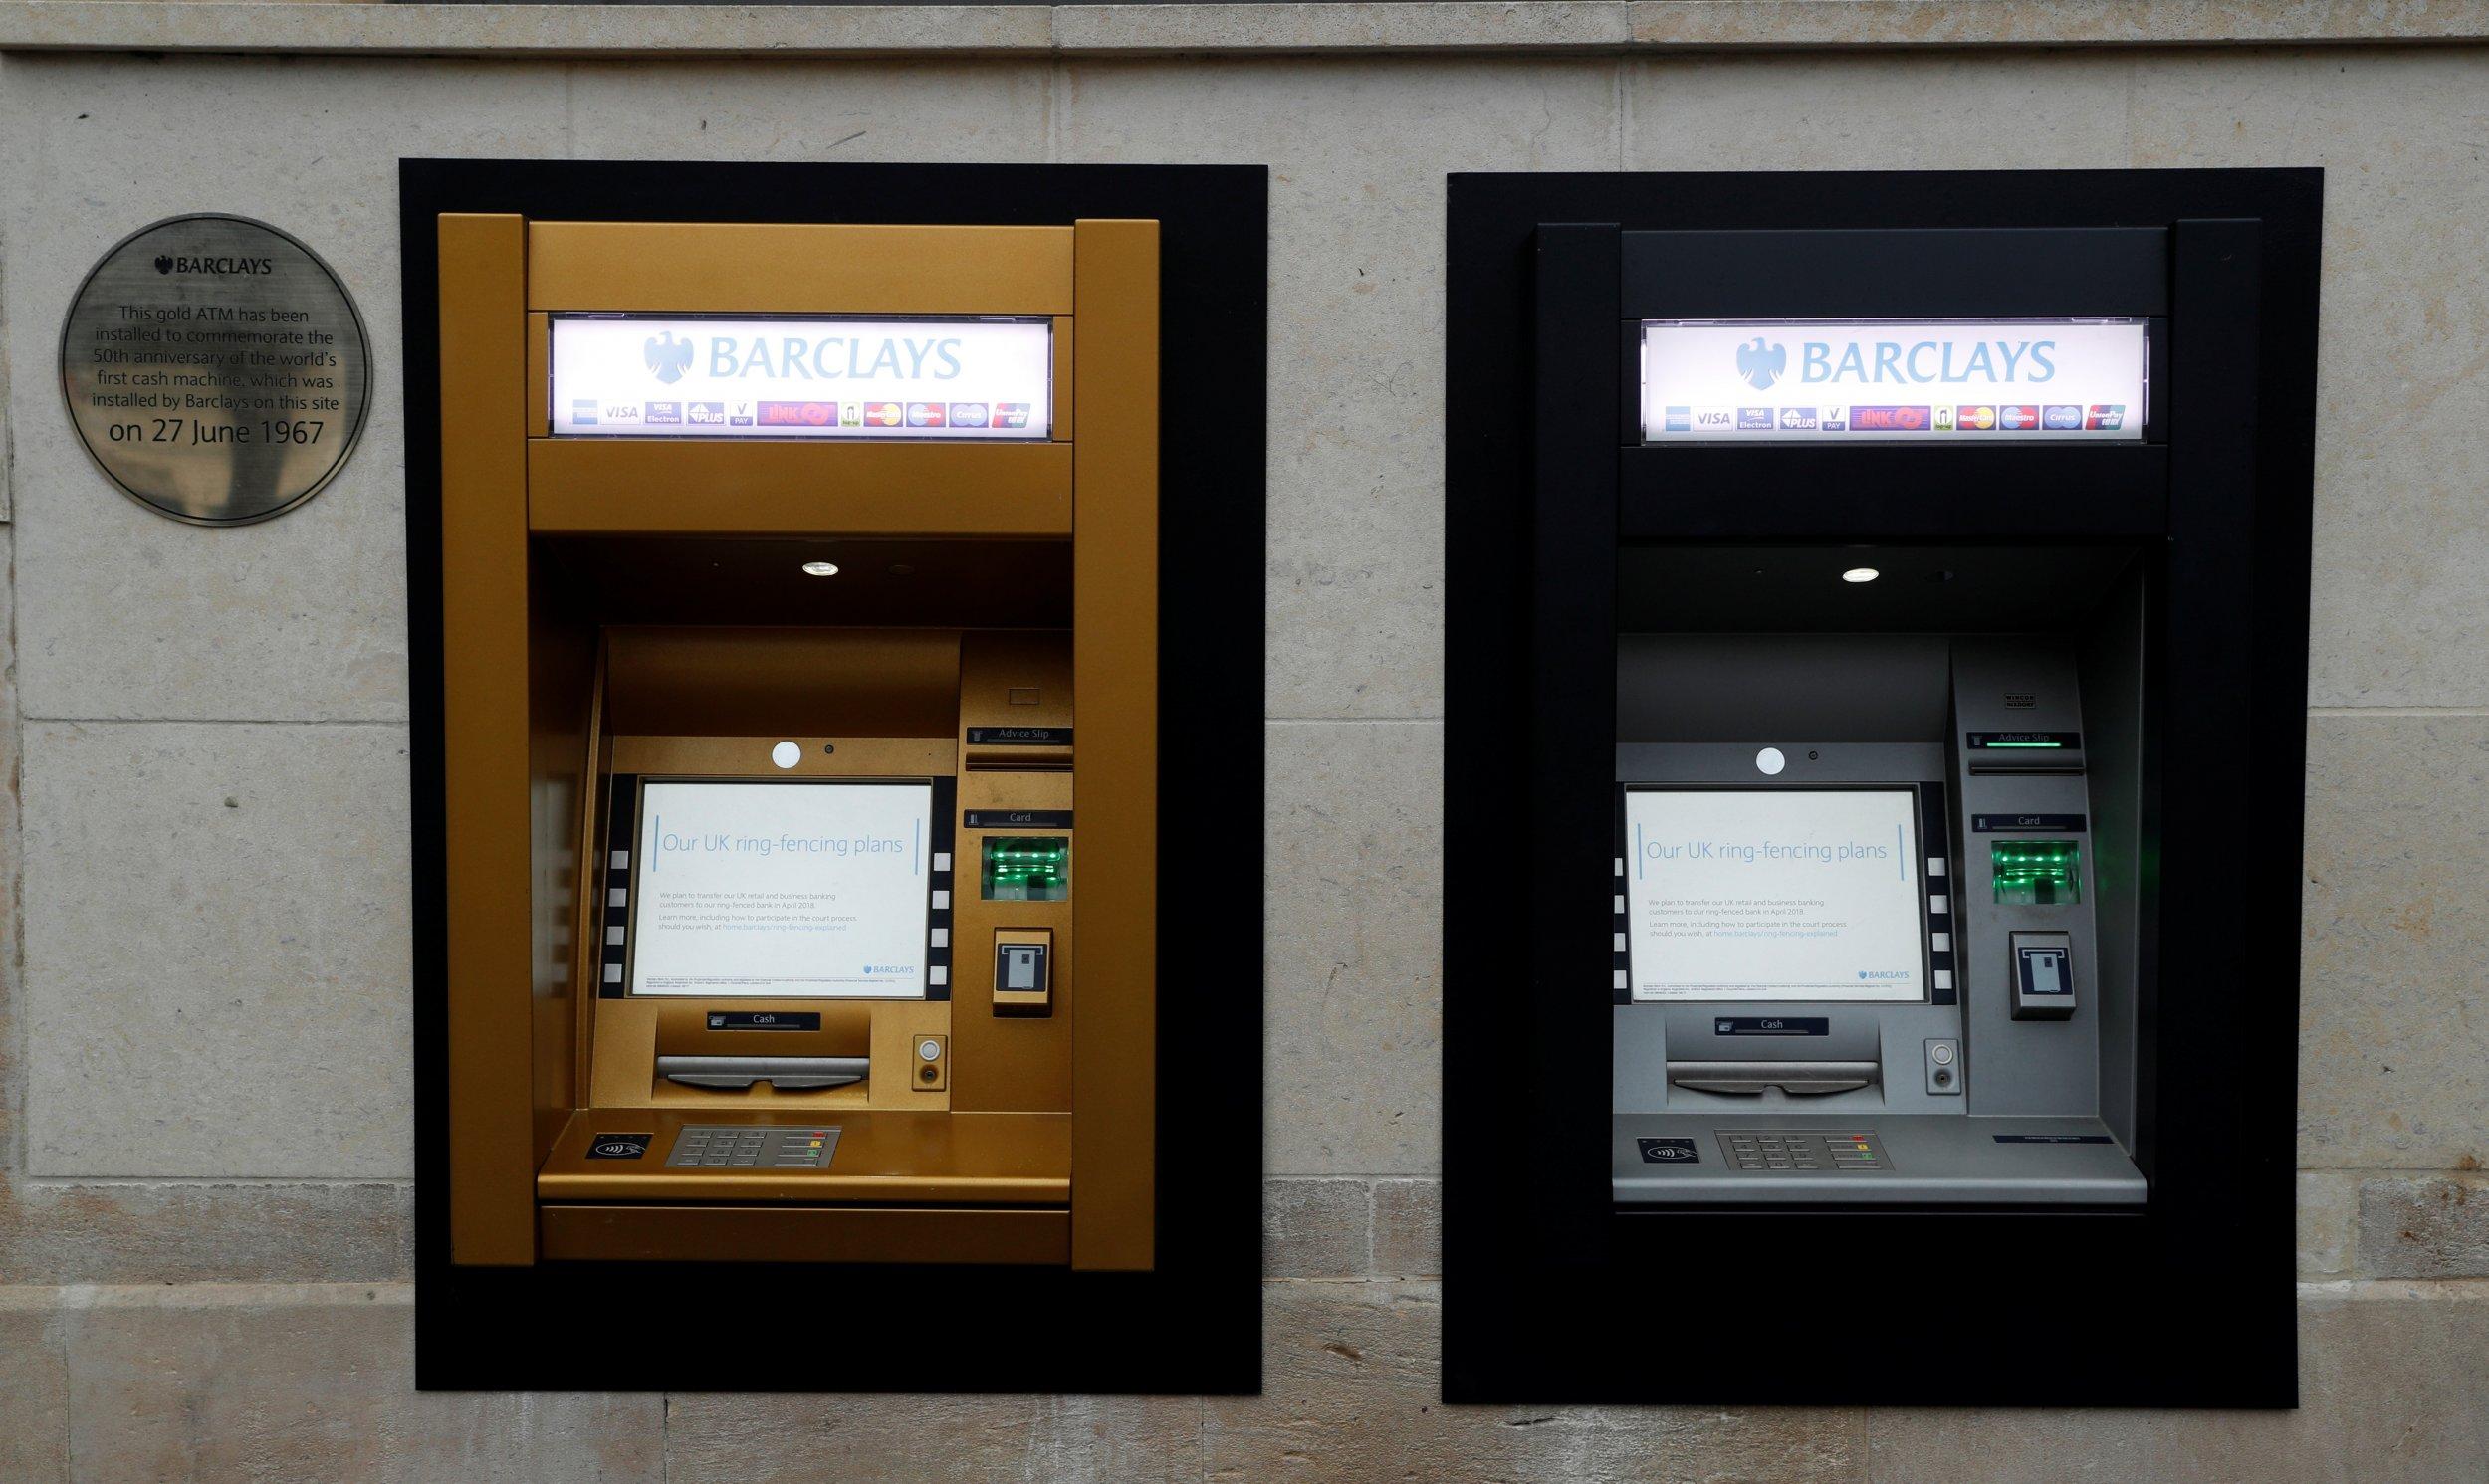 atm jackpotting malware bank robbery